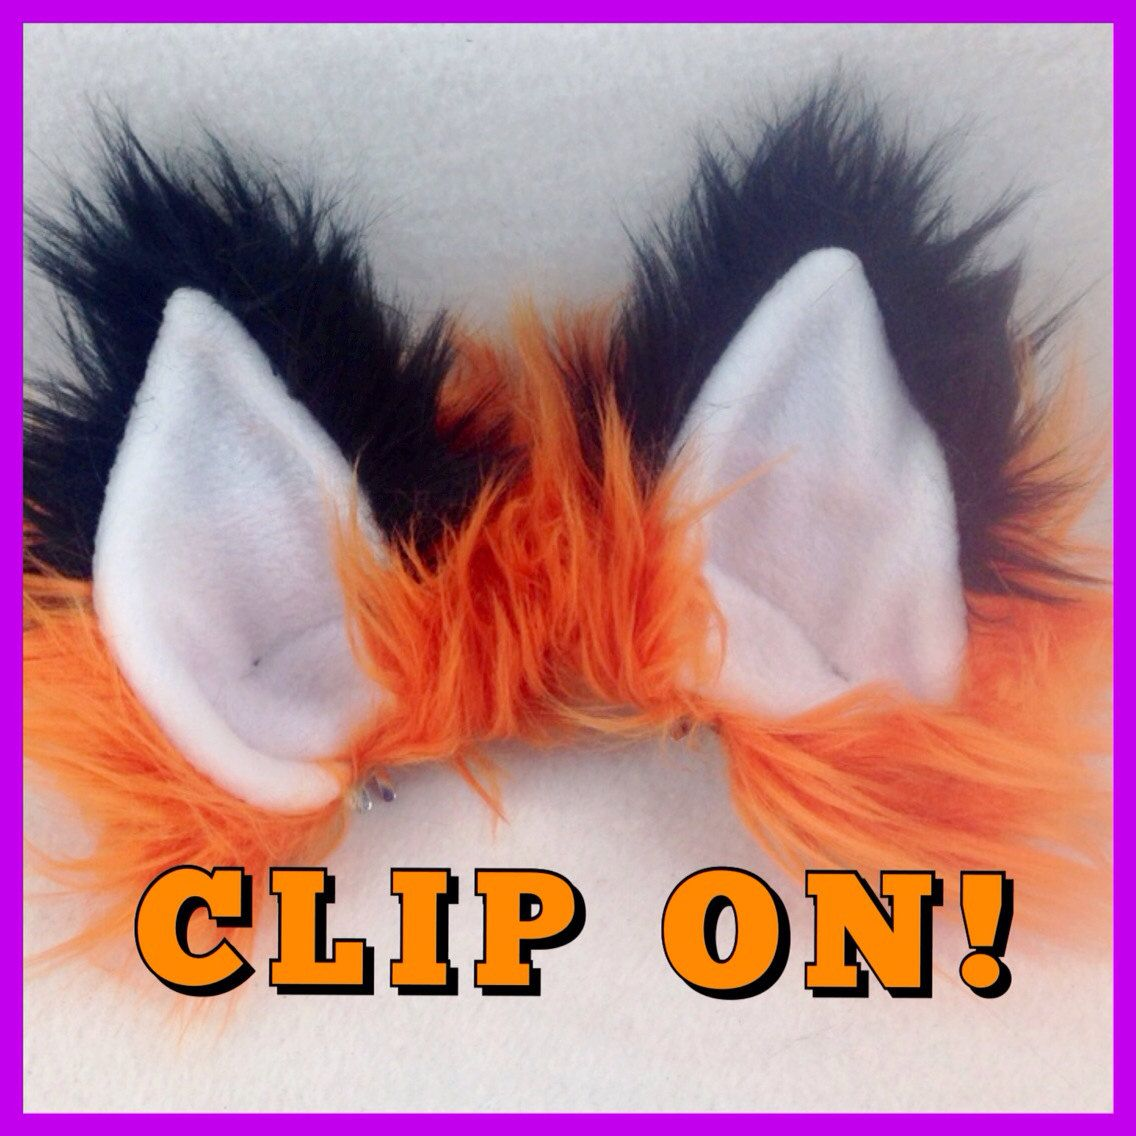 CLIP ON FOX Ears Yopu Pick Color Costume Cosplay Anime By